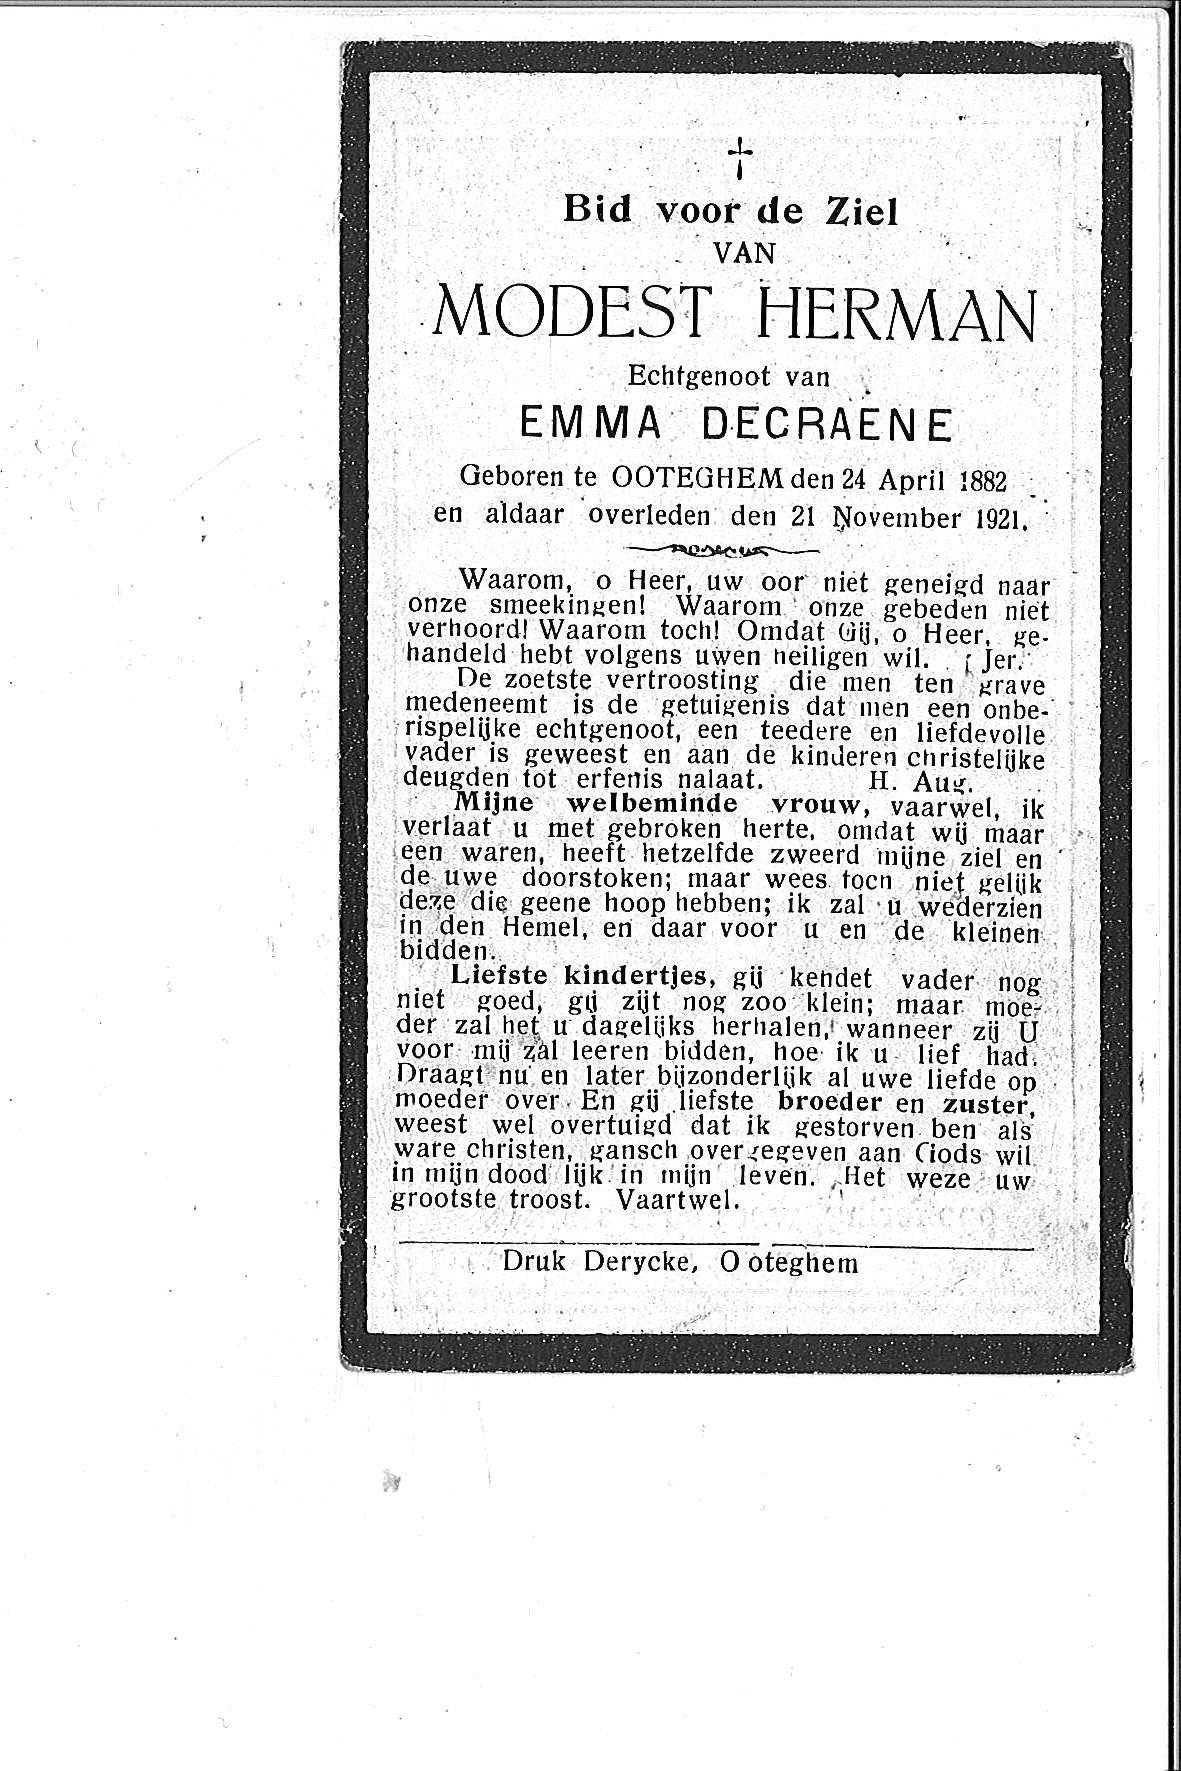 Modest(1921)20150309164130_00024.jpg